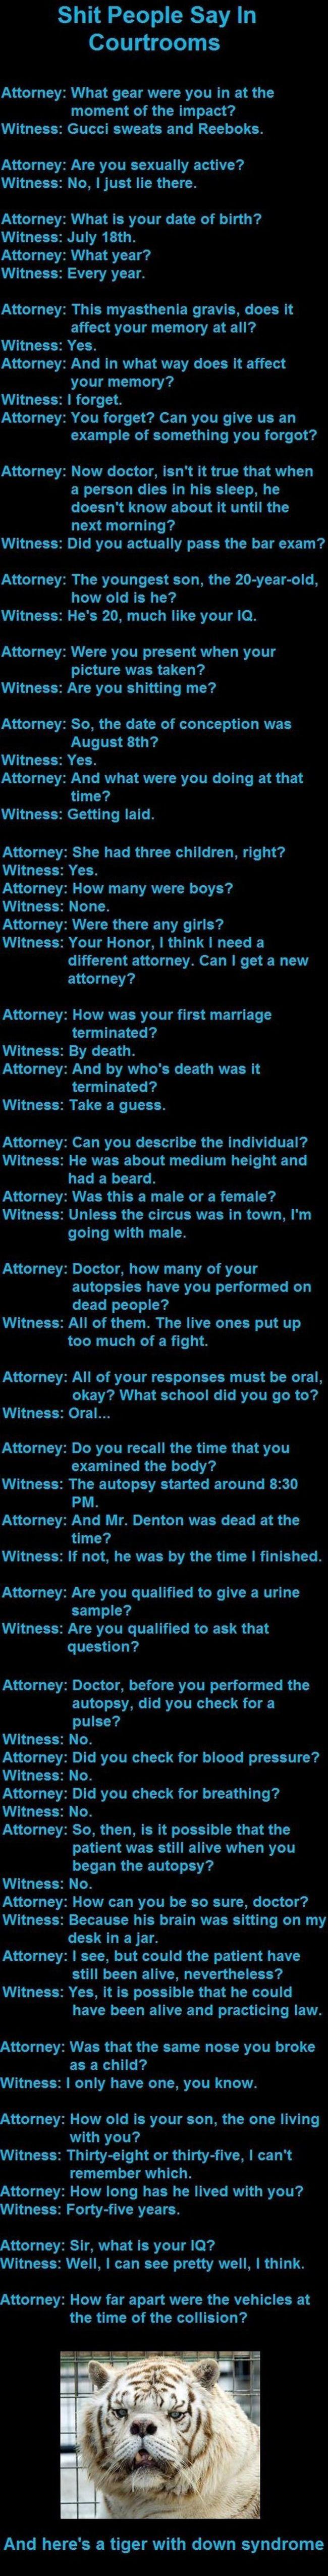 Stupid lawyers.